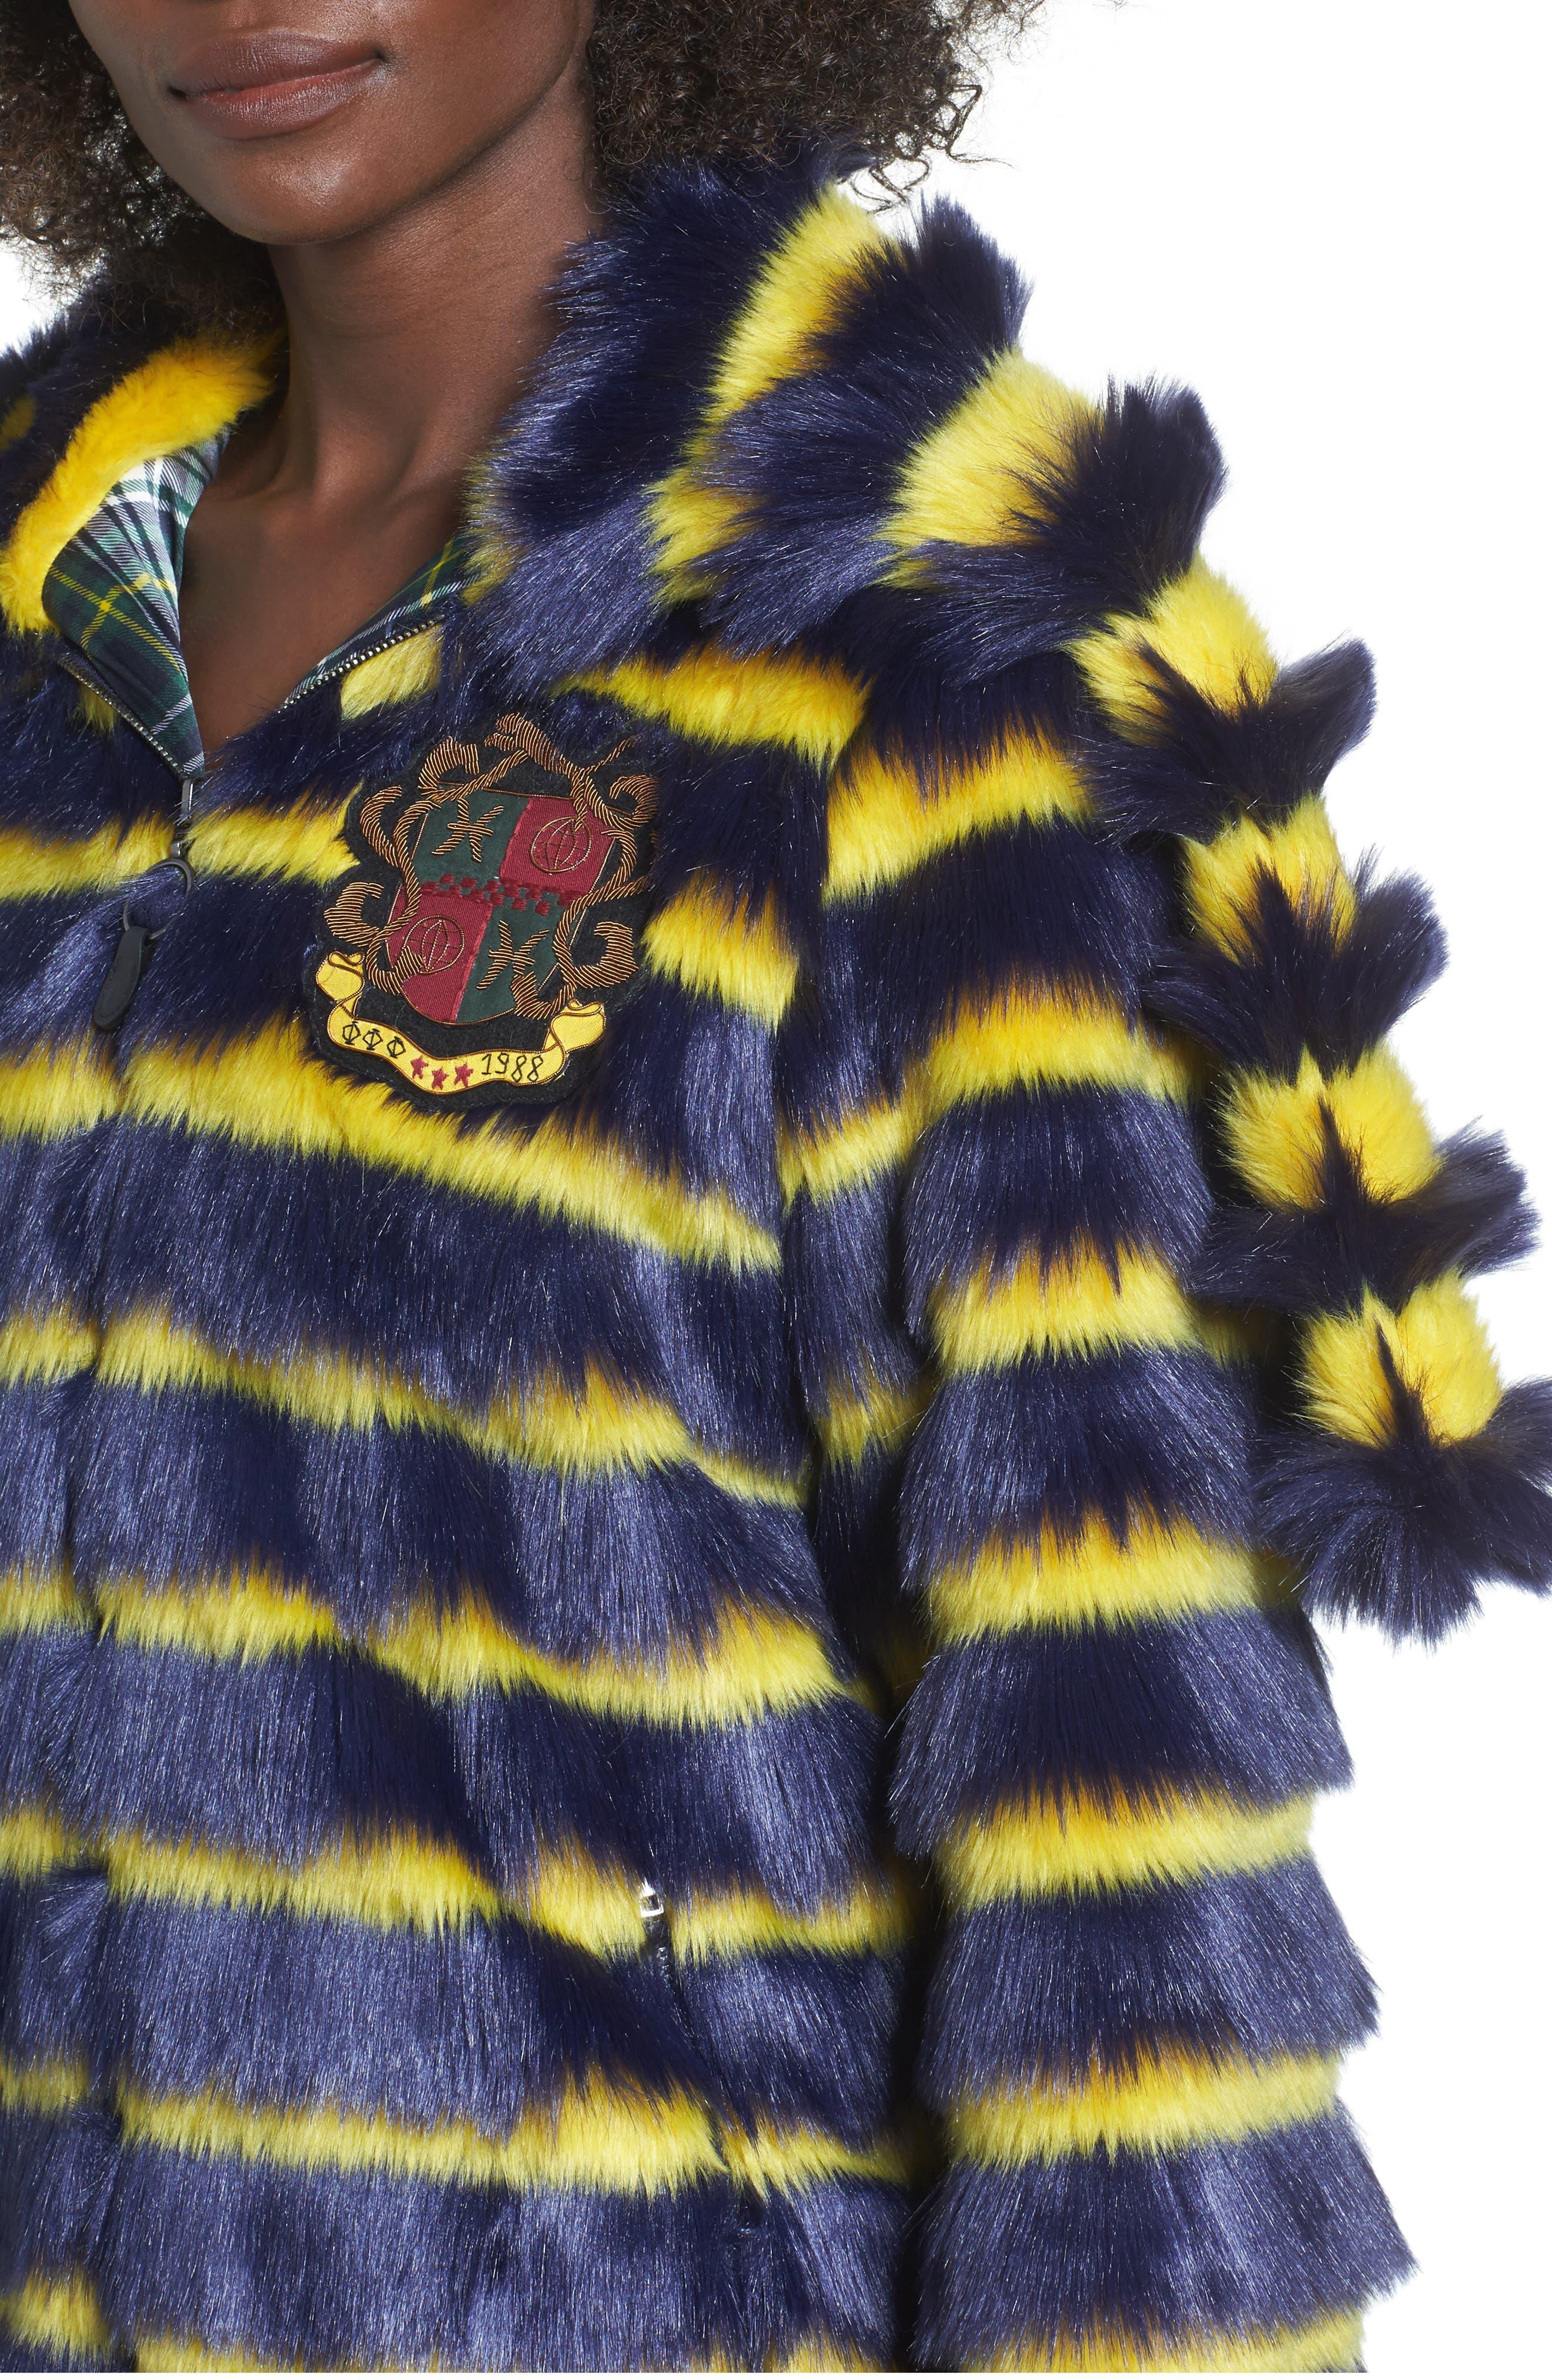 PUMA by Rihanna Faux Shearling Hooded Jacket,                             Alternate thumbnail 4, color,                             400